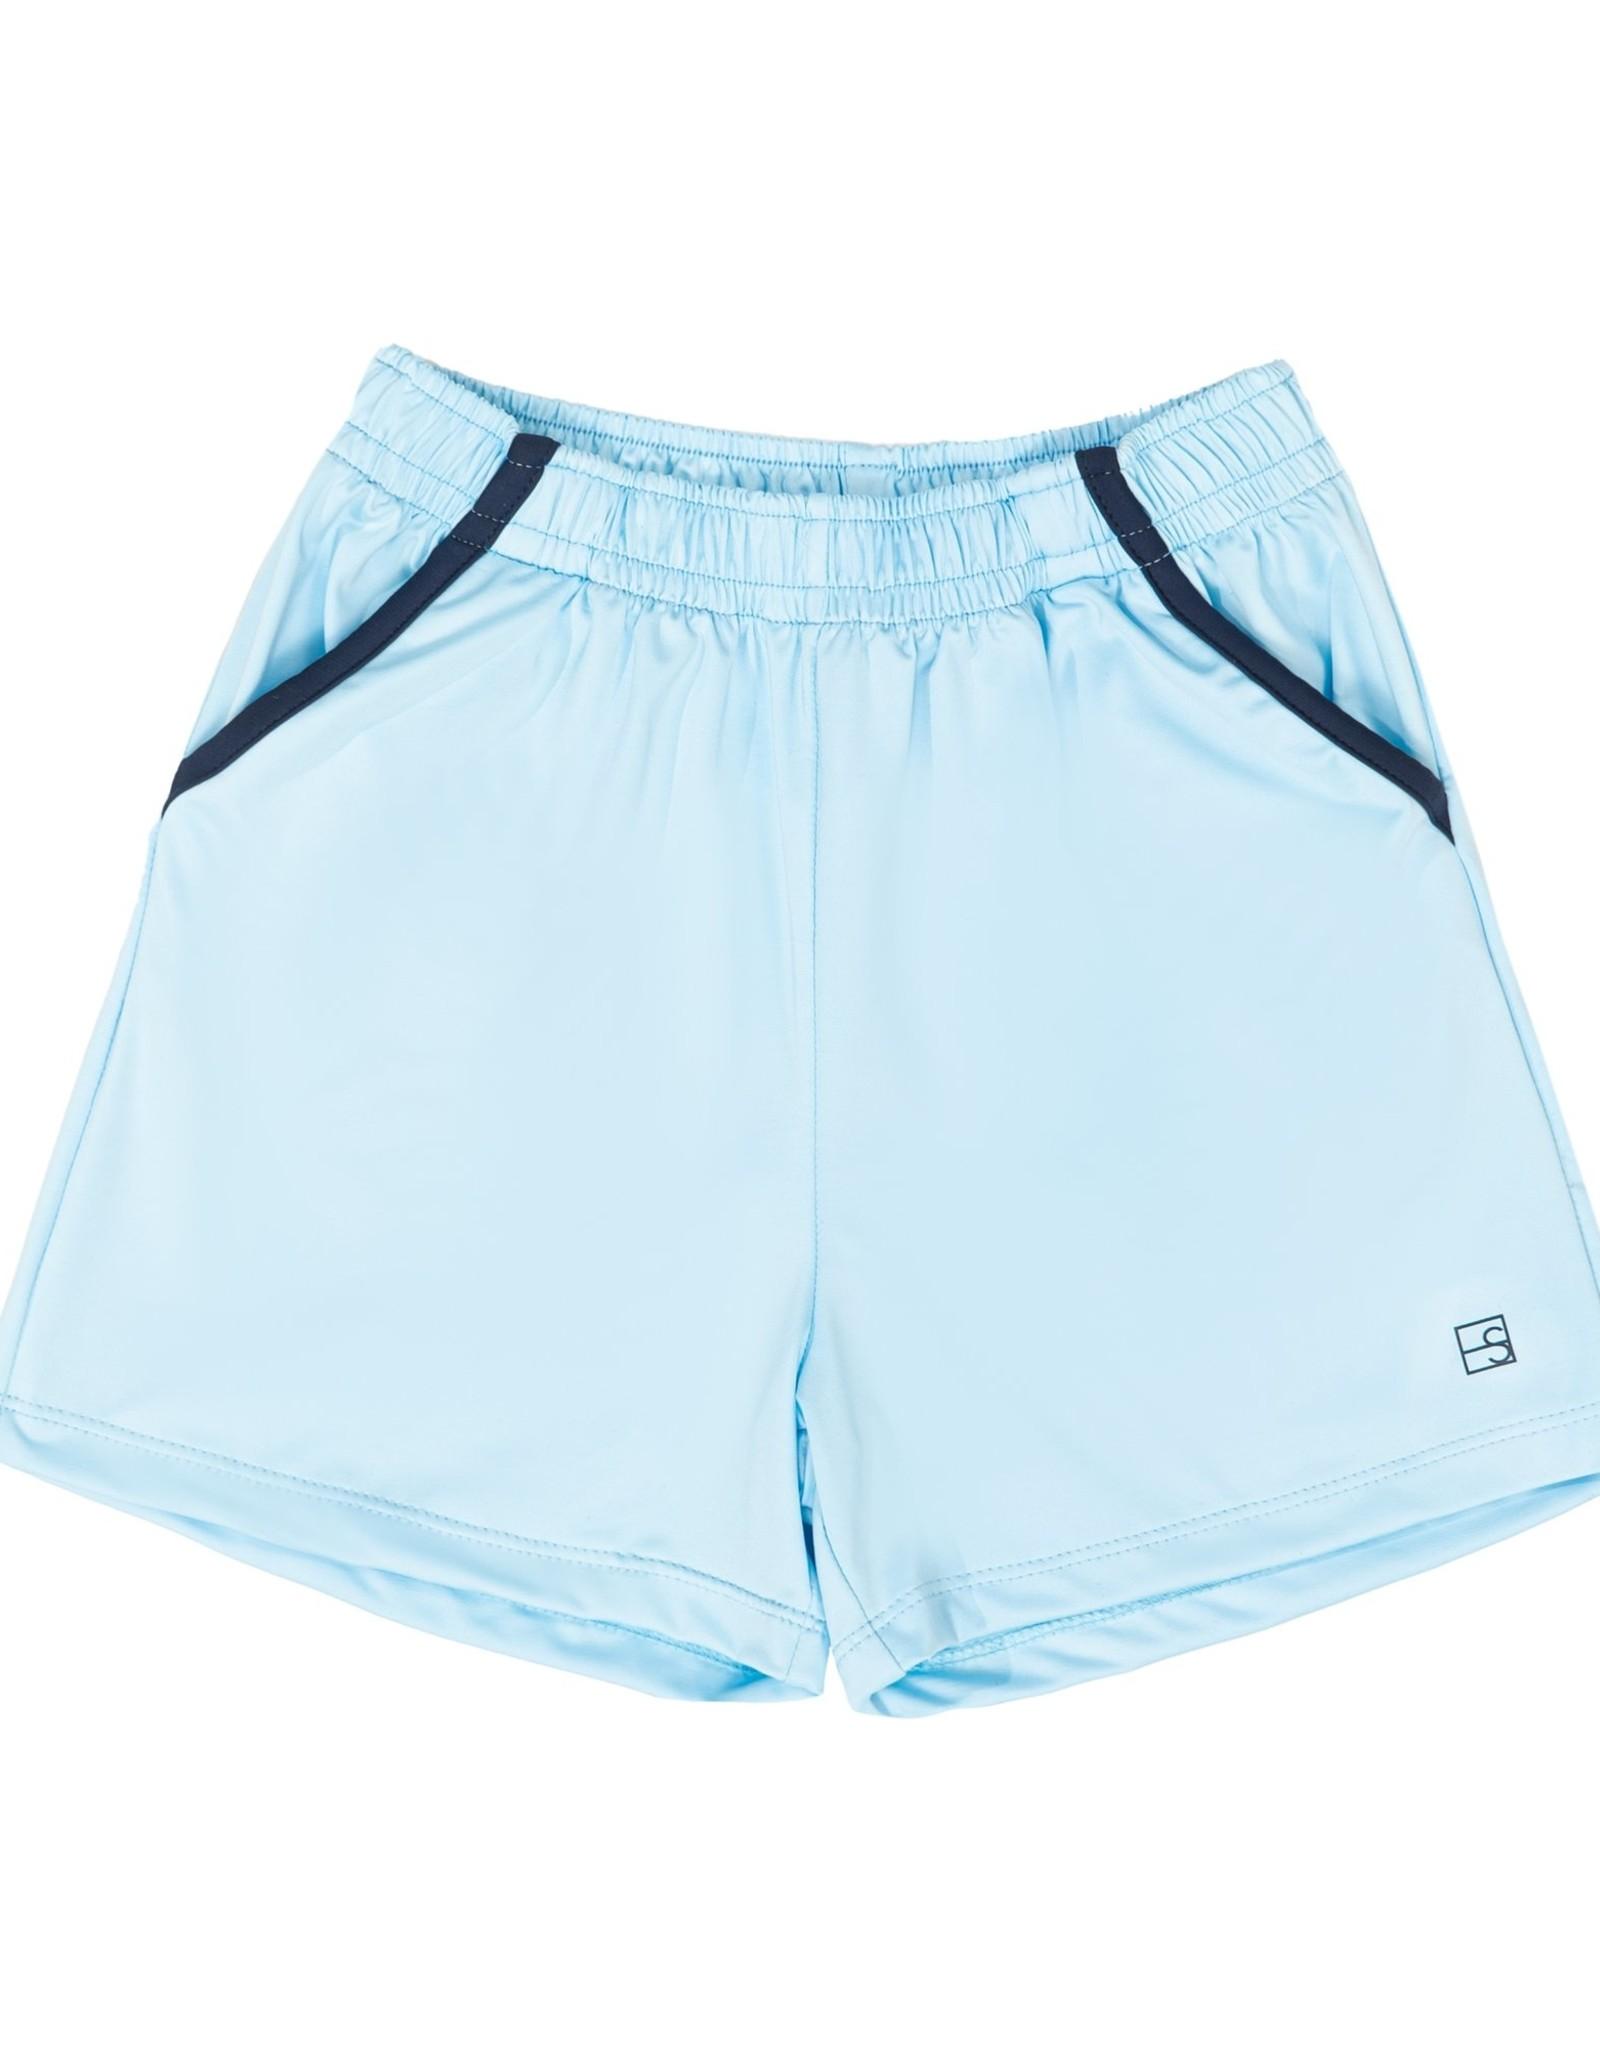 SET Nathan Short - Light Blue w/ Navy Welting